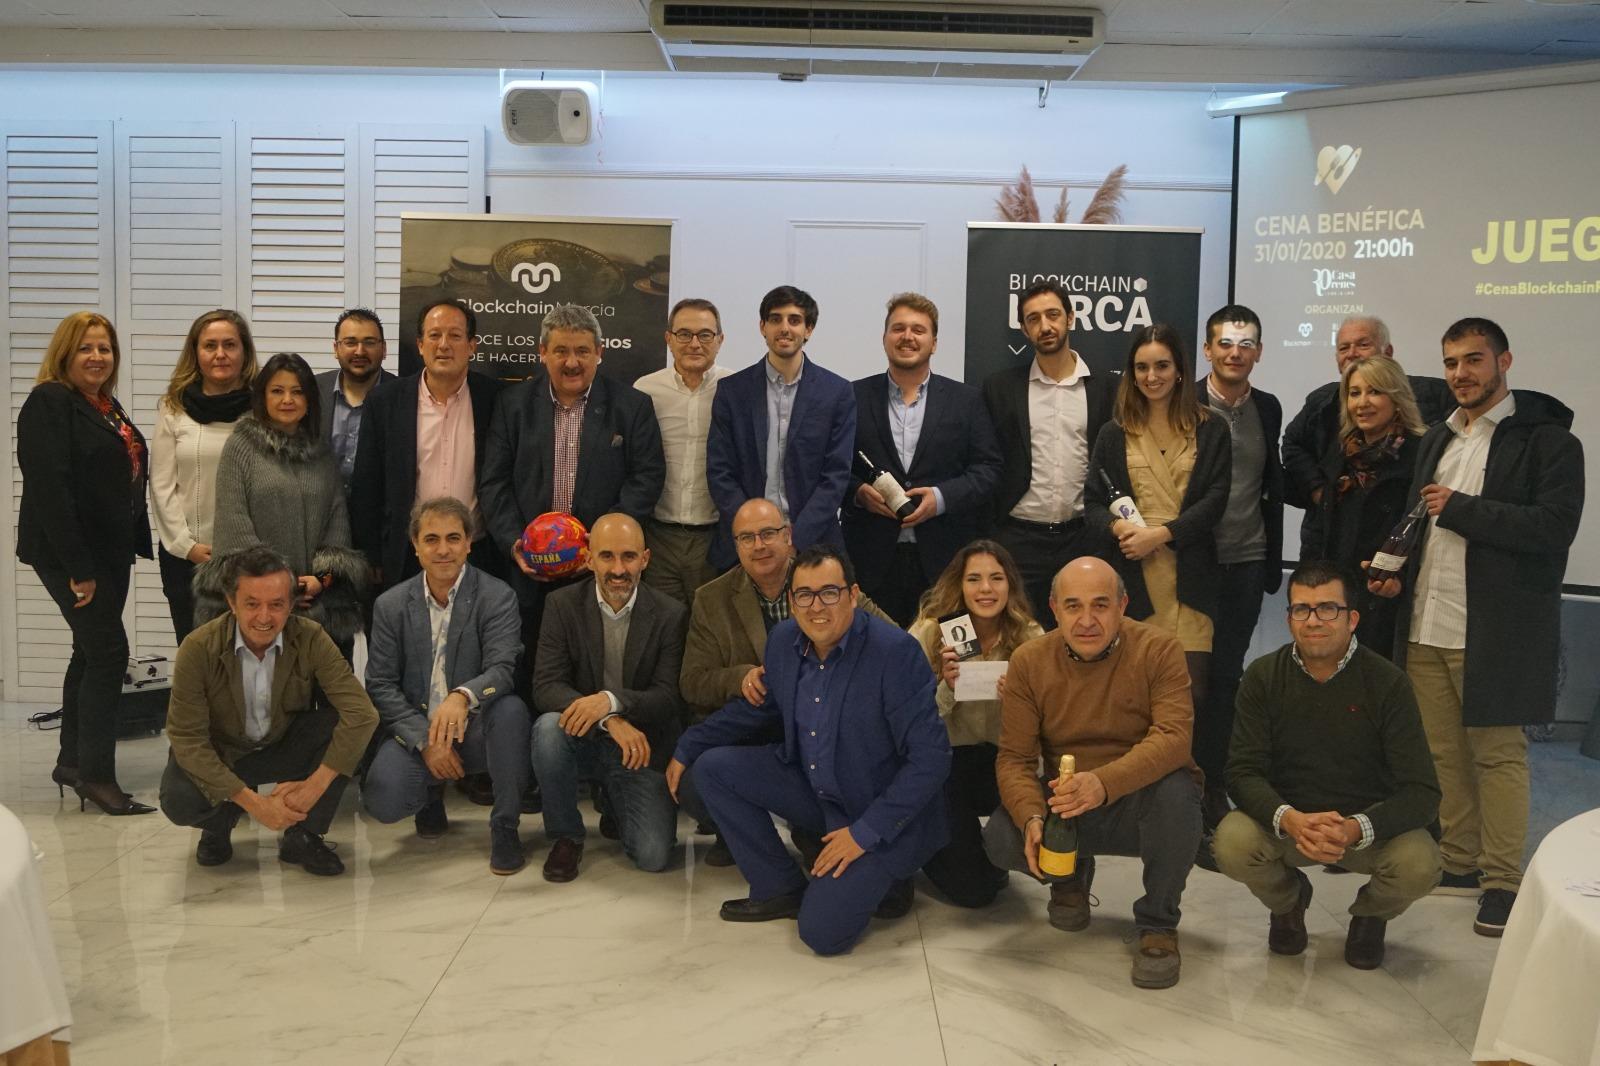 Cena benéfica Blockchain Región de Murcia 2020